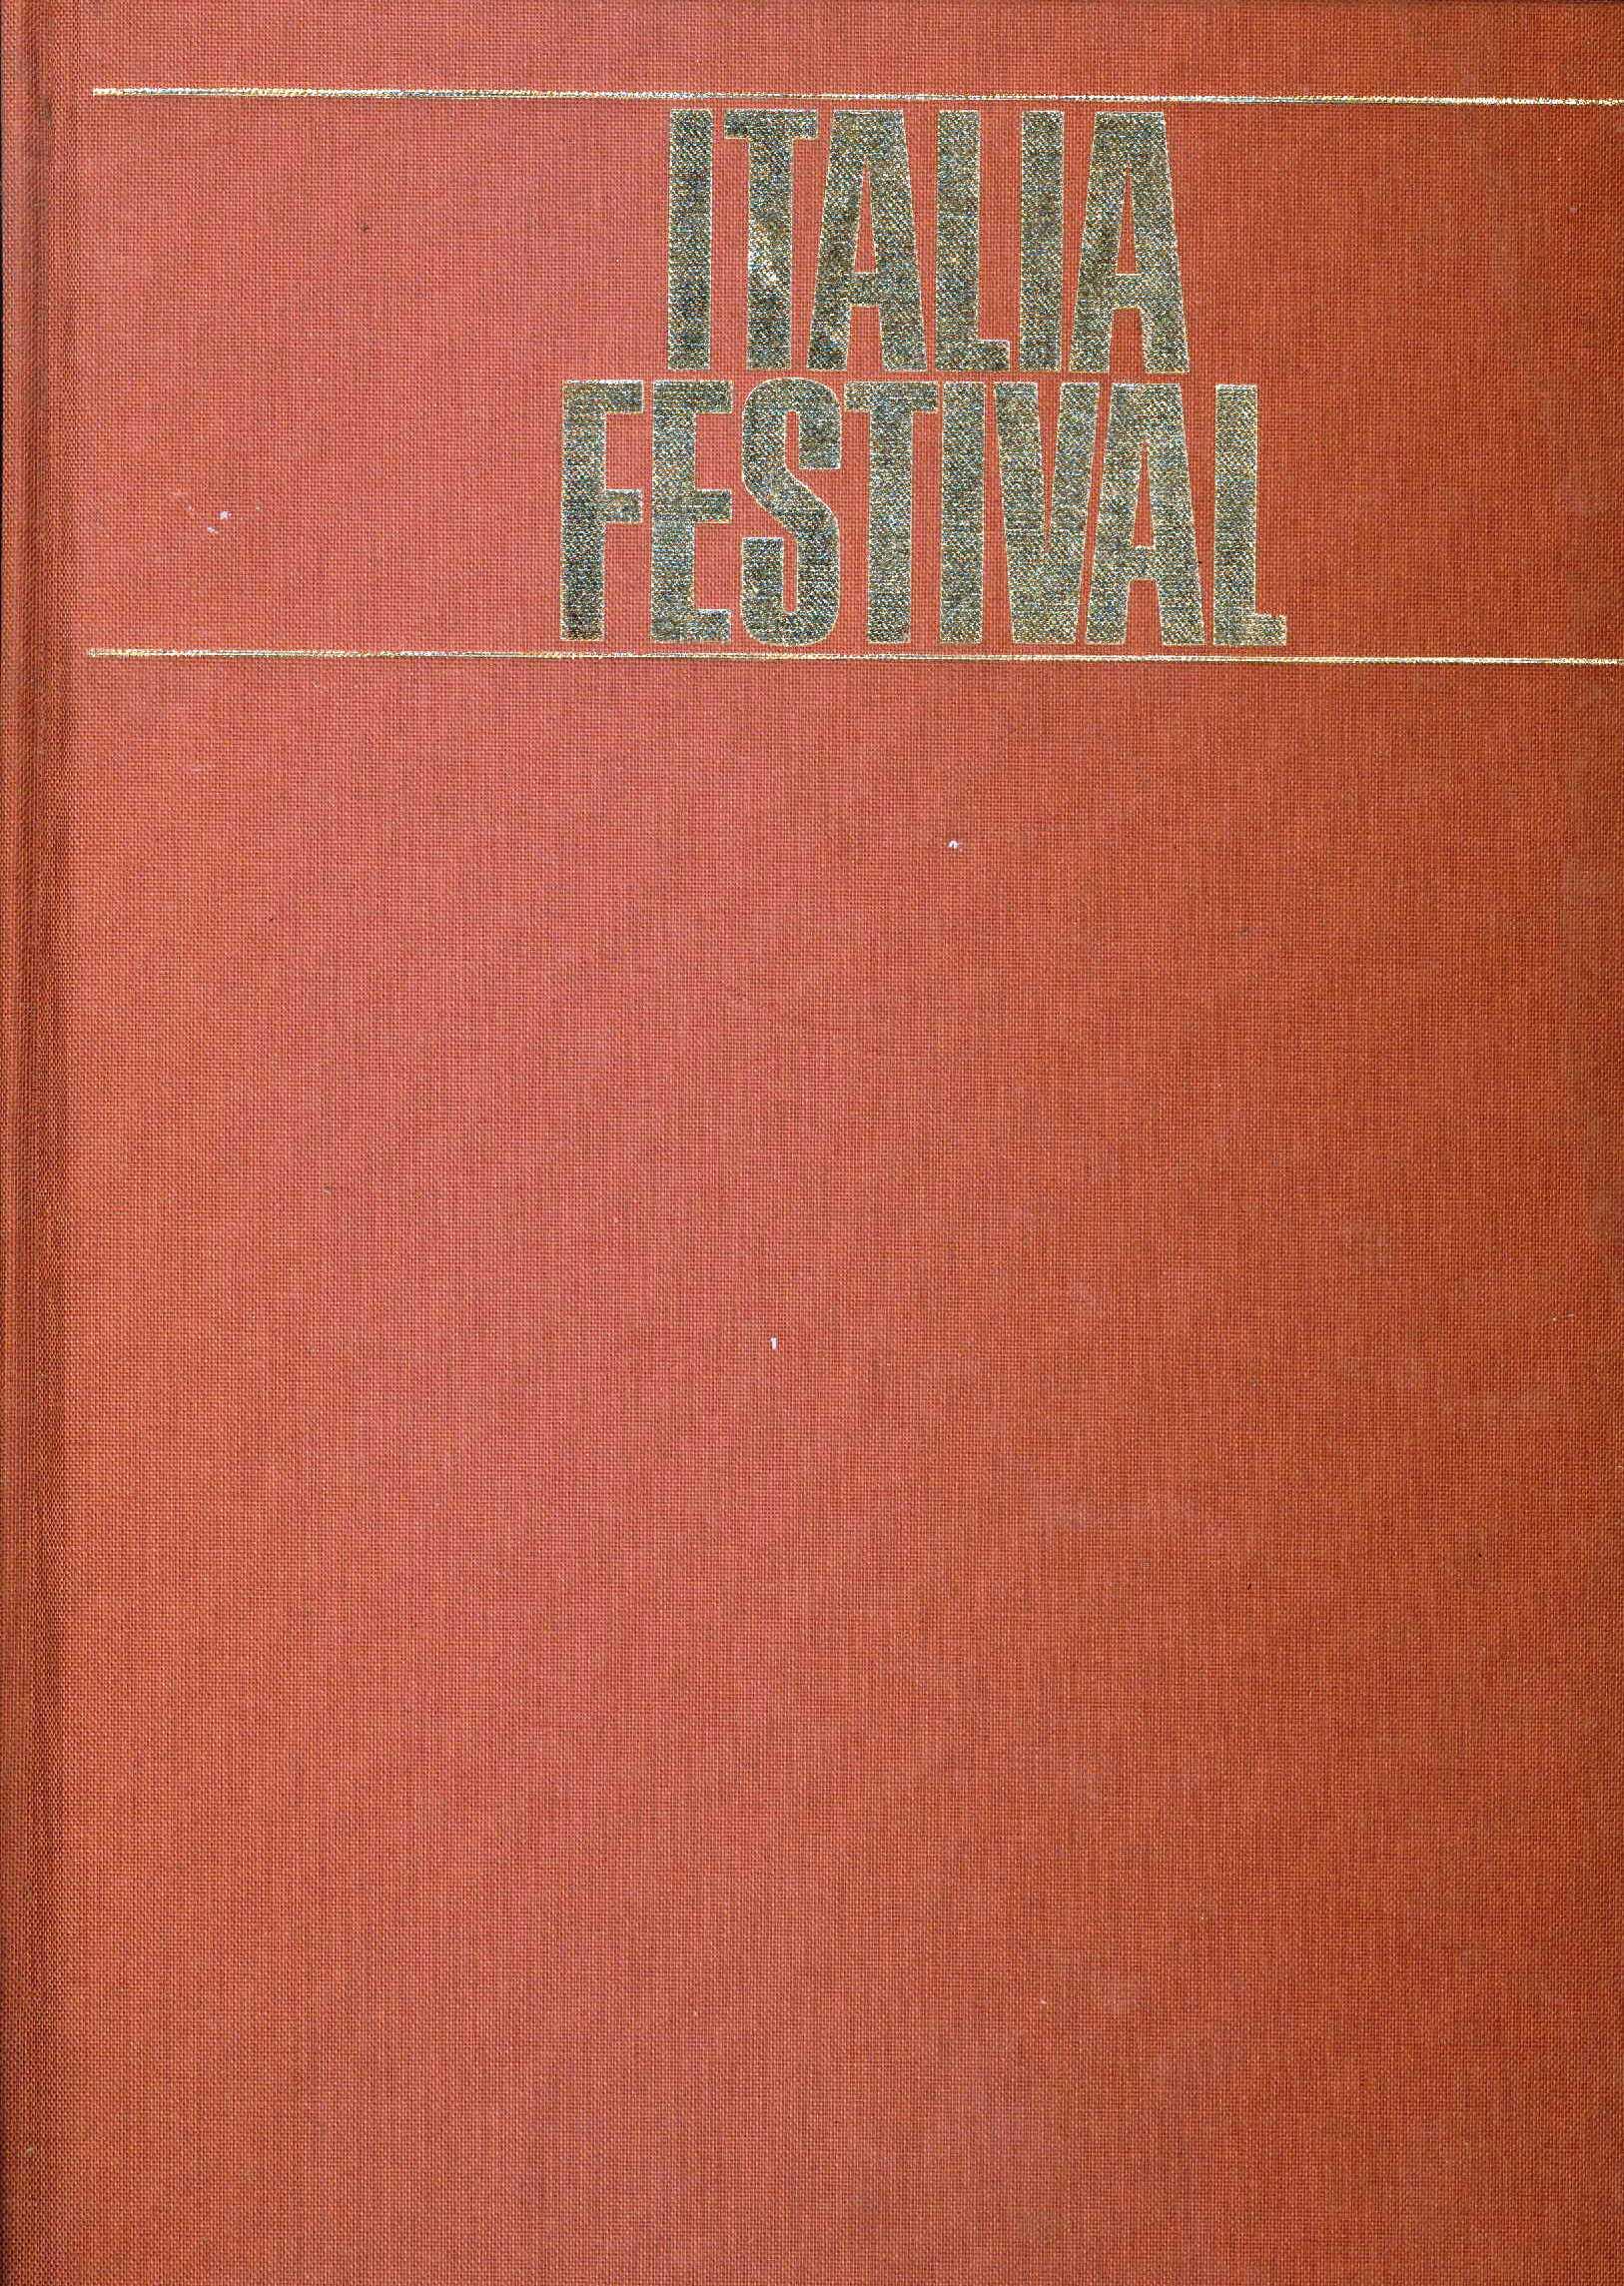 Italia festival